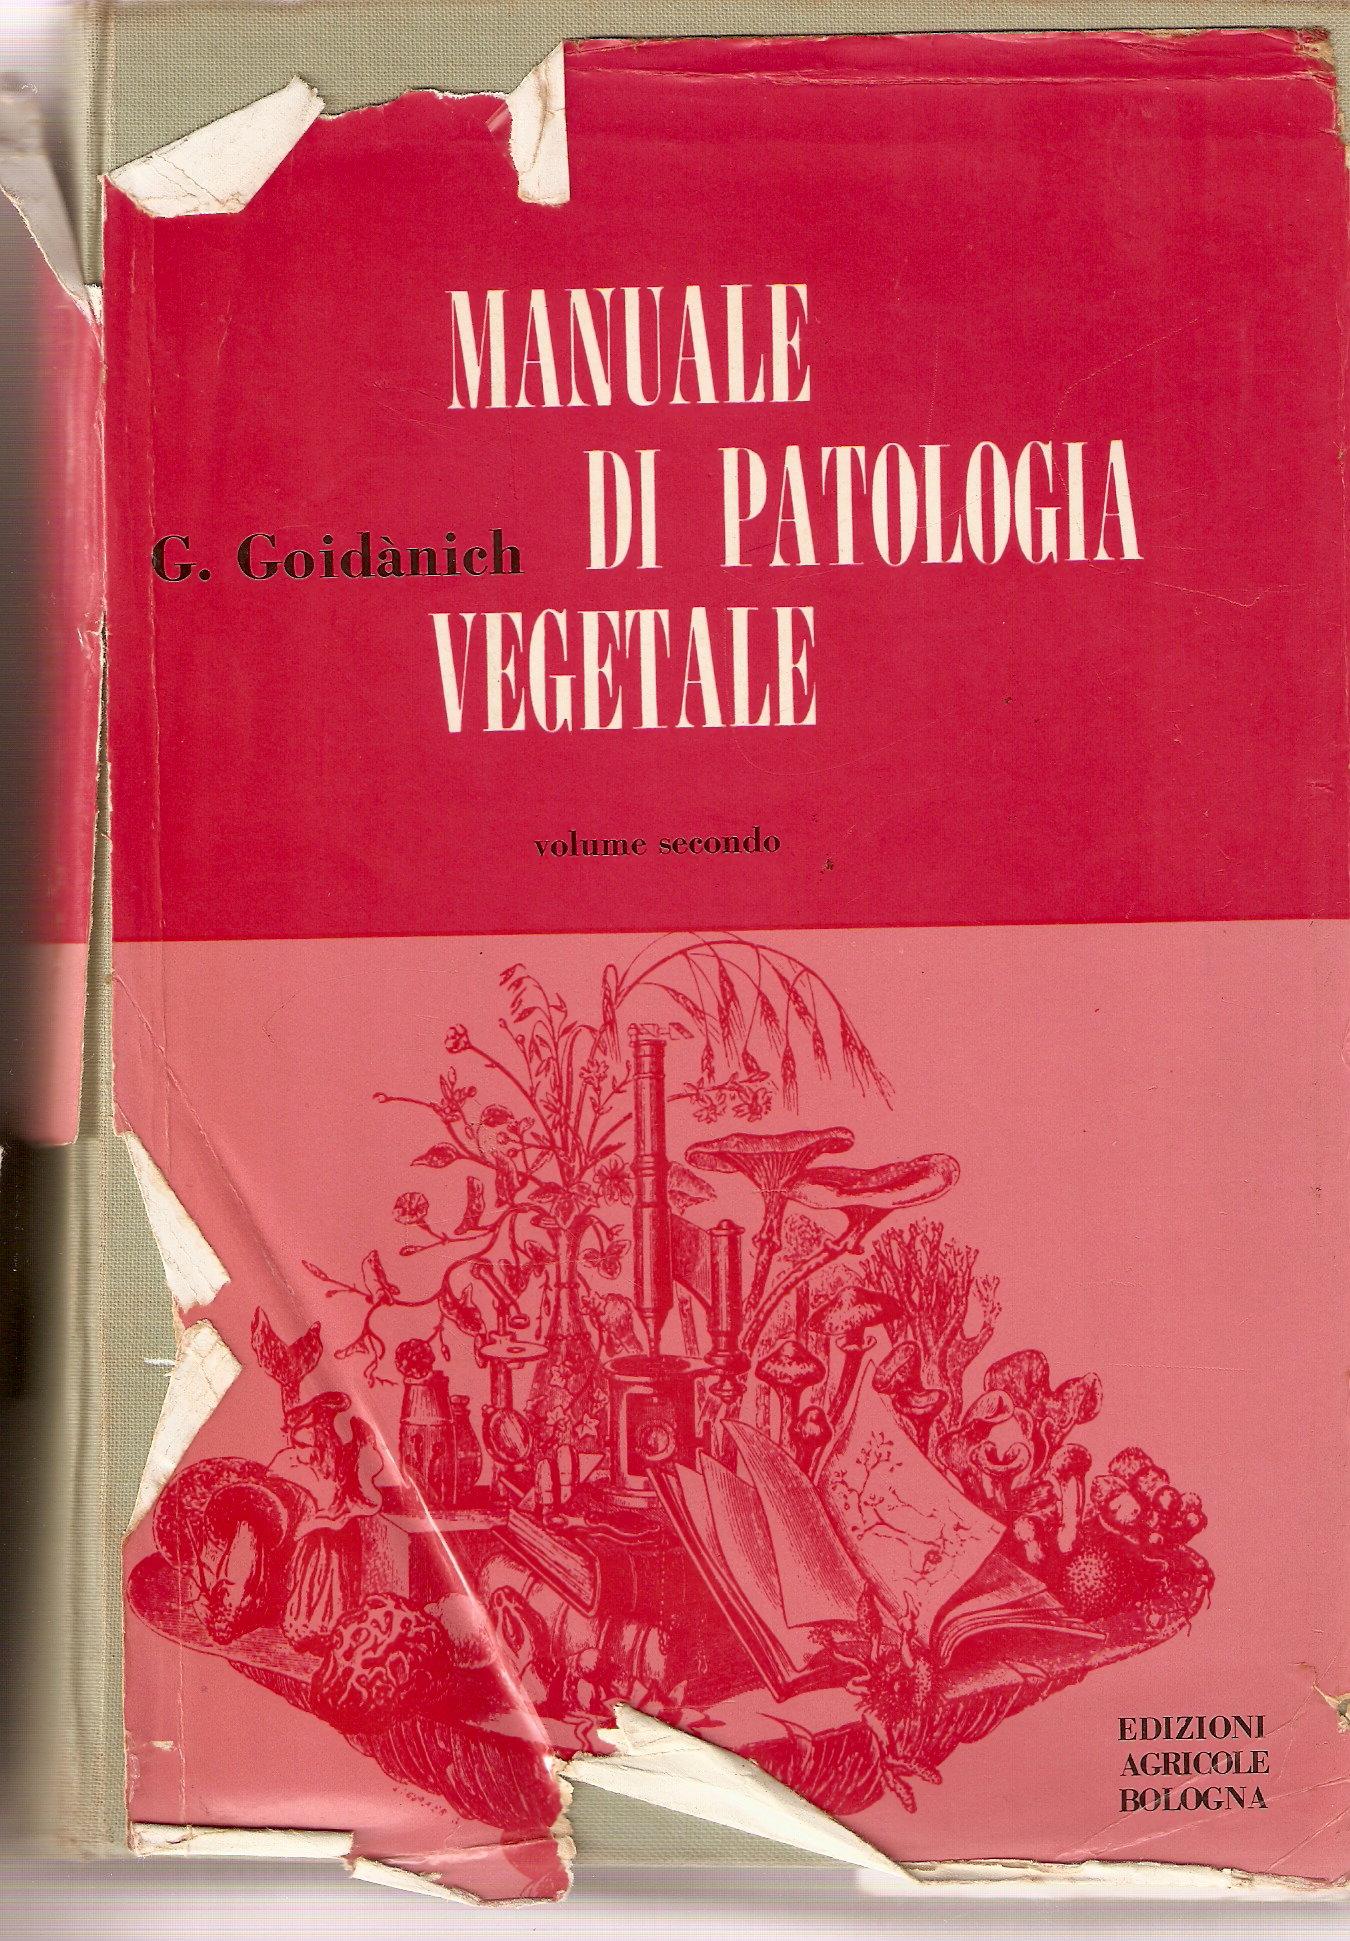 Manuale di patologia vegetale - vol. II